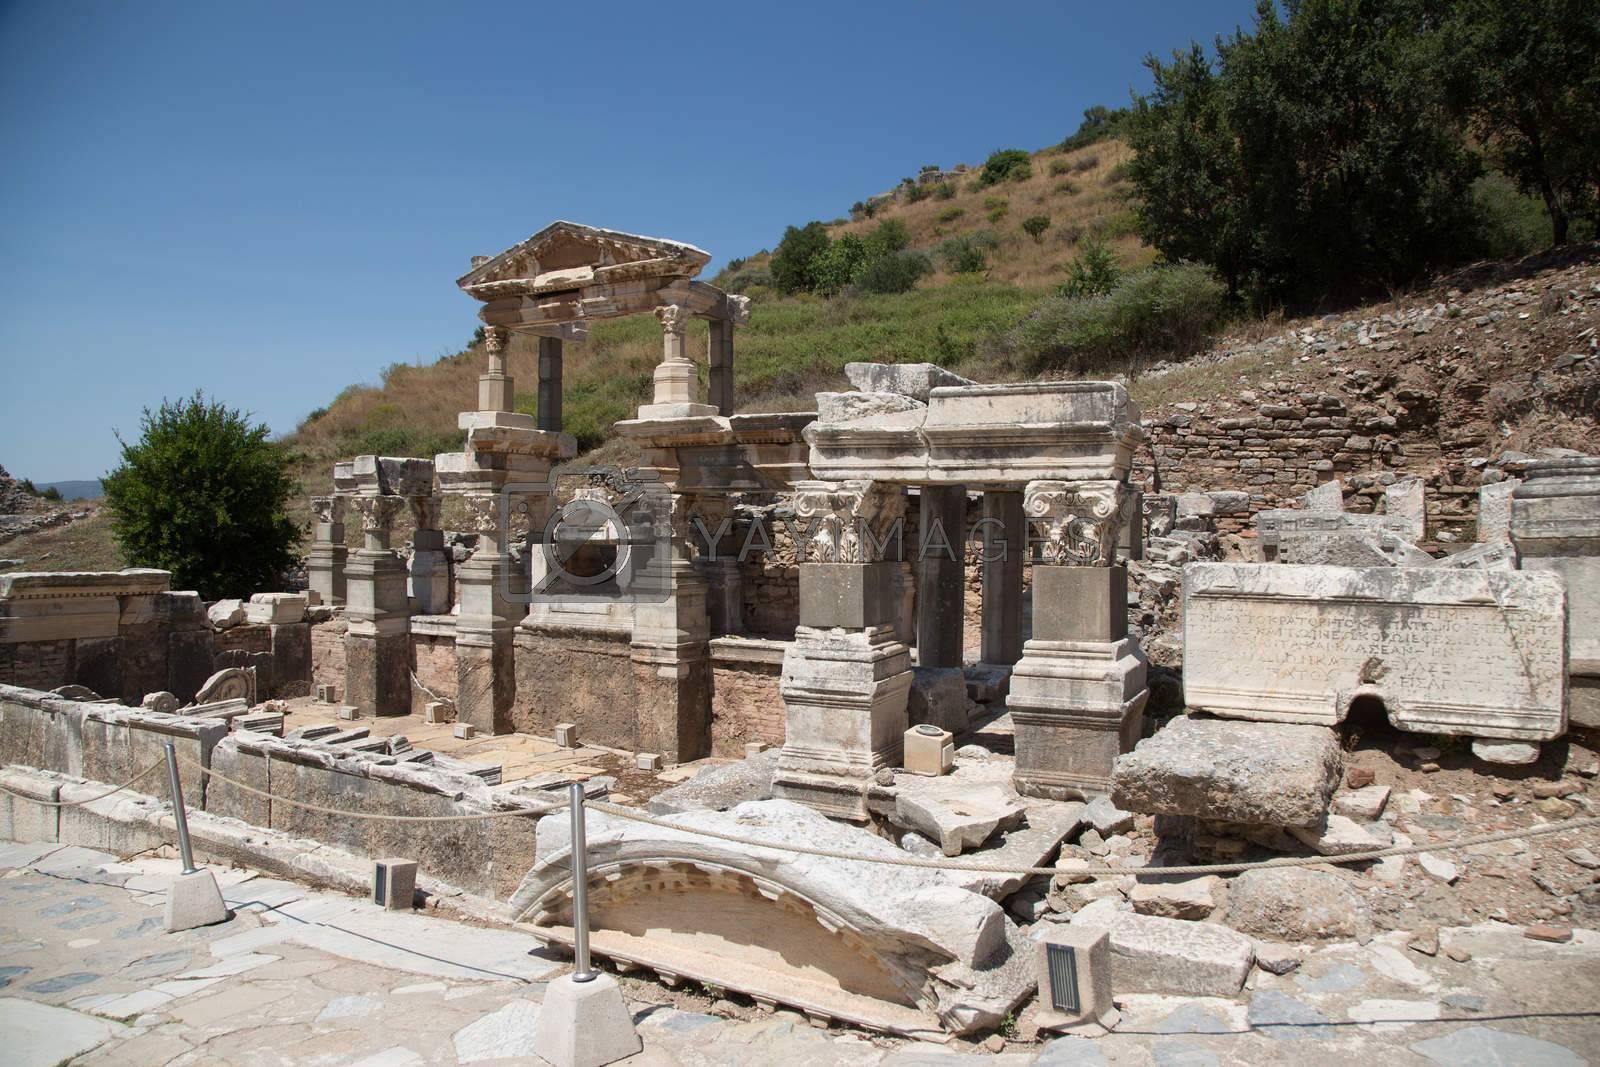 Fountain of Trajan in Ephesus Ancient City by EvrenKalinbacak